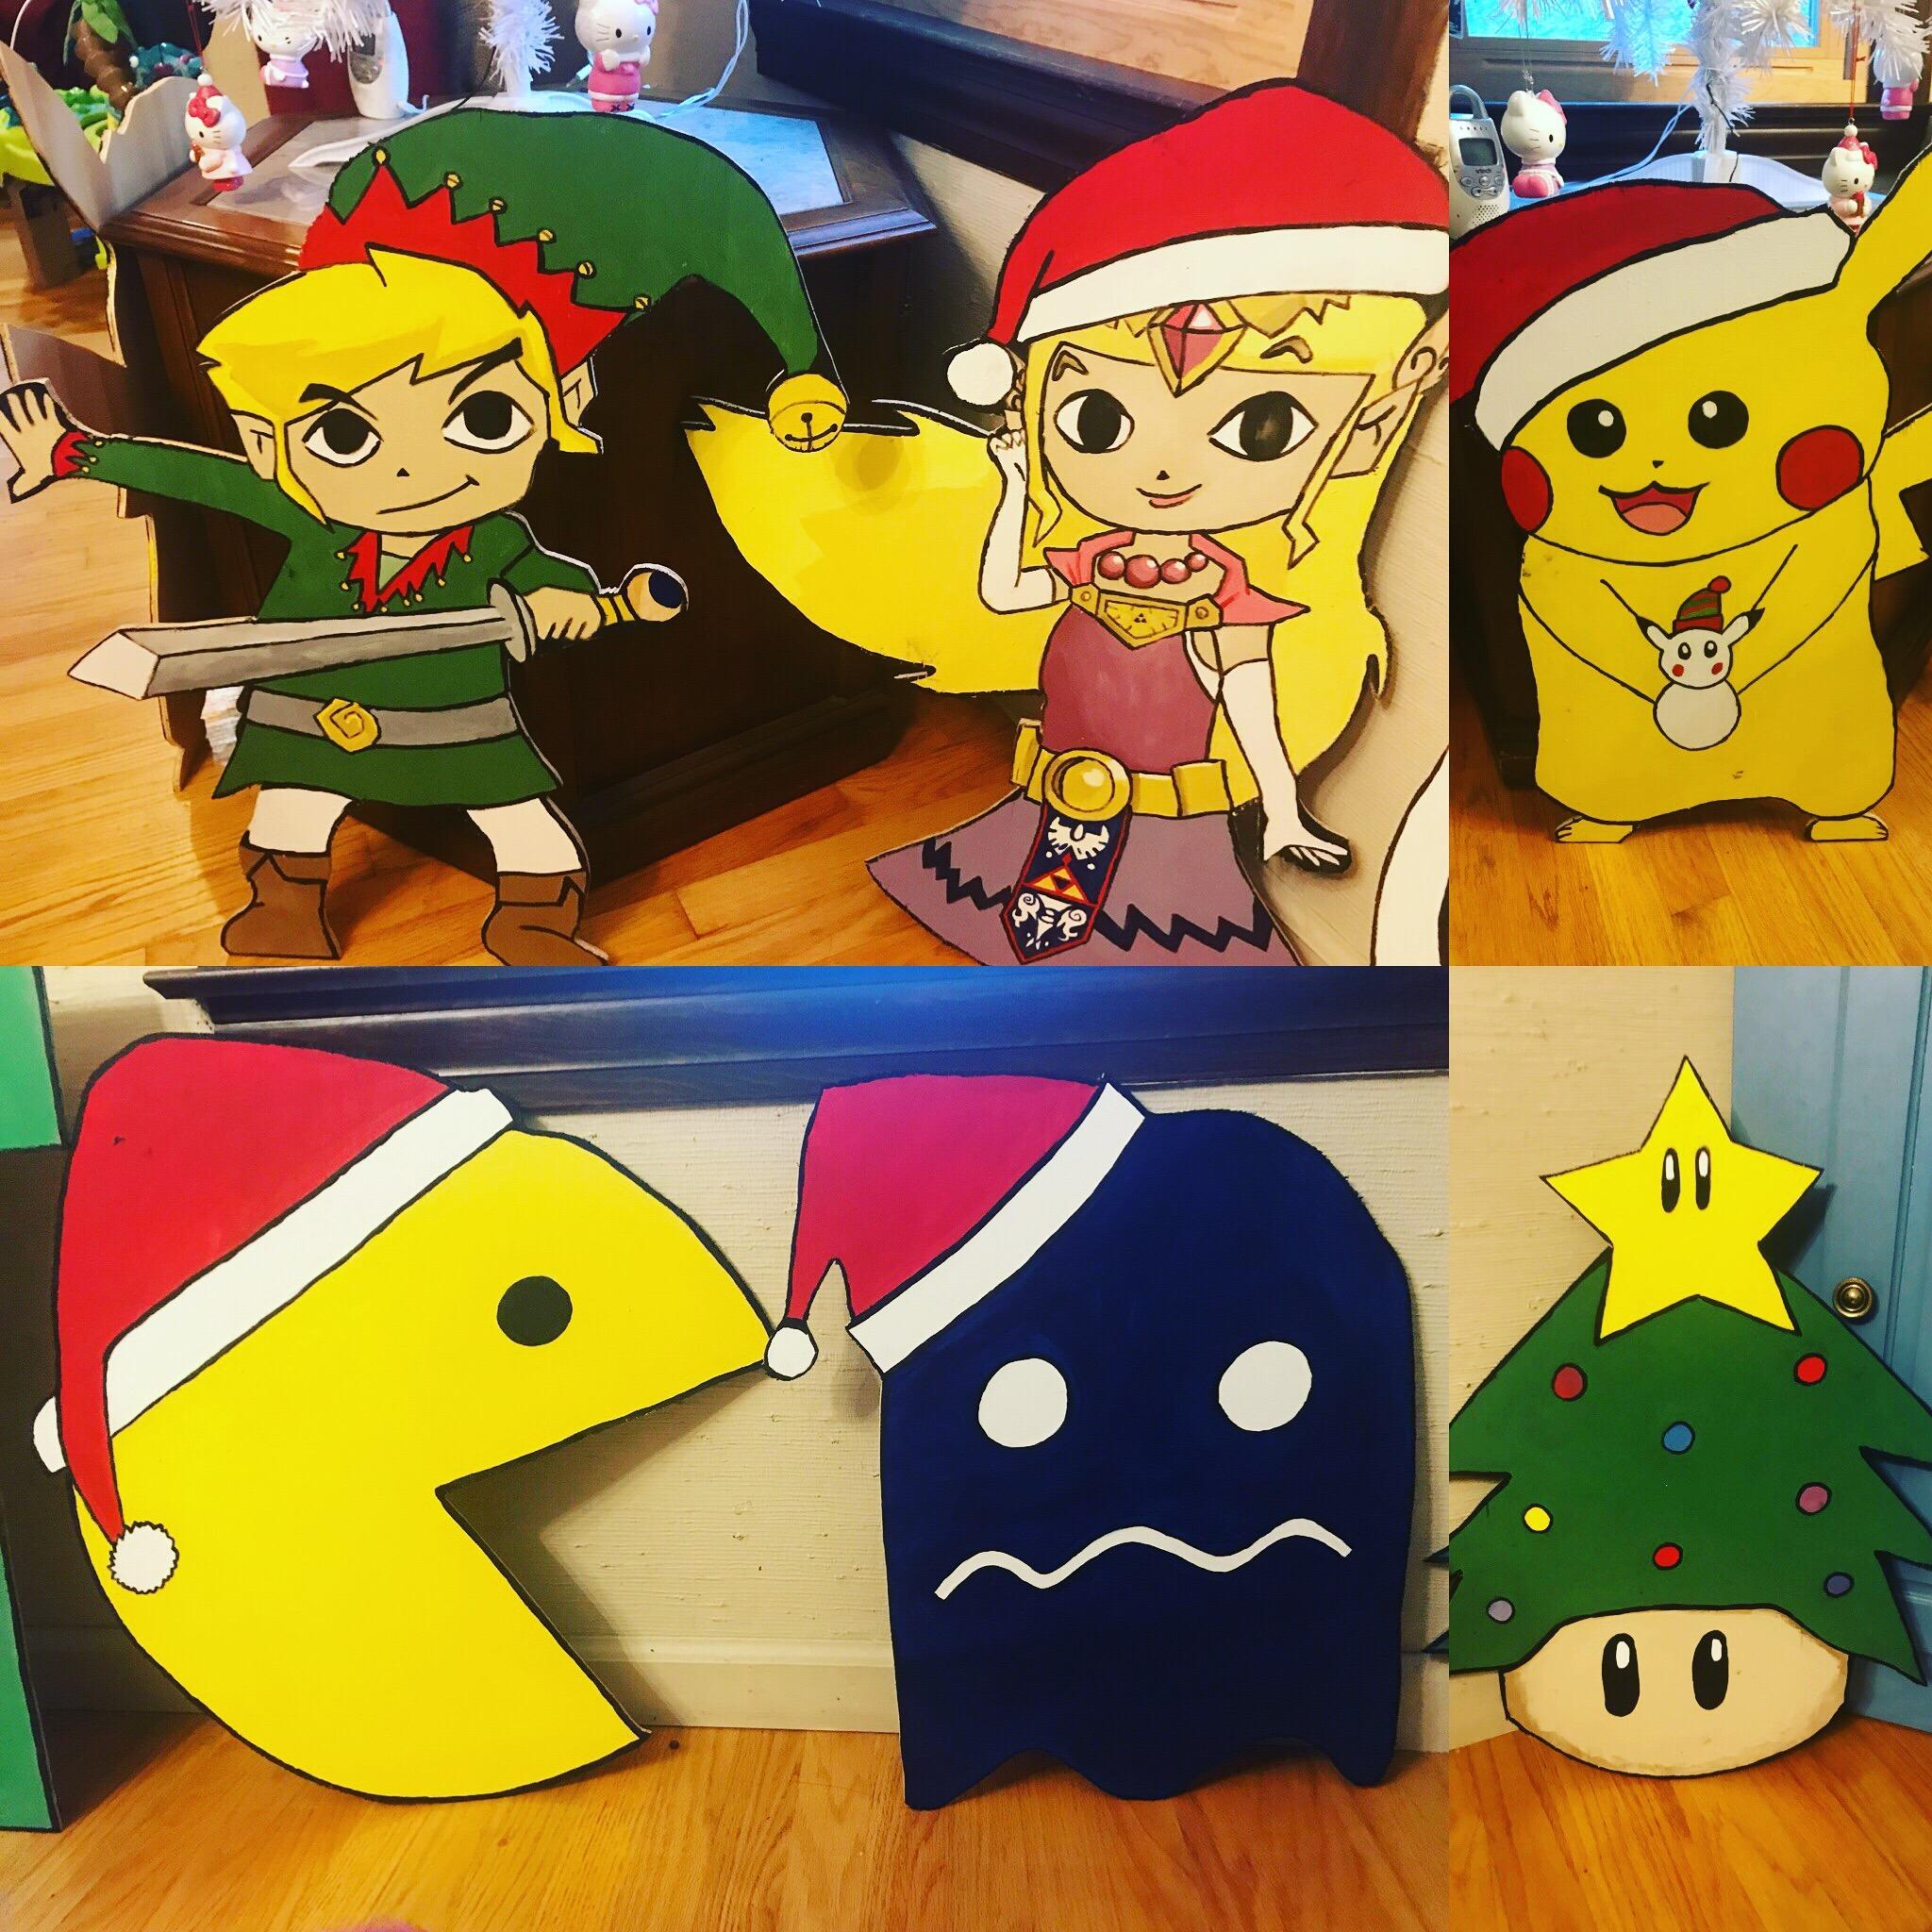 Zelda, Link, Pikachu, PacMan (with ghost), and Christmas Mushroom